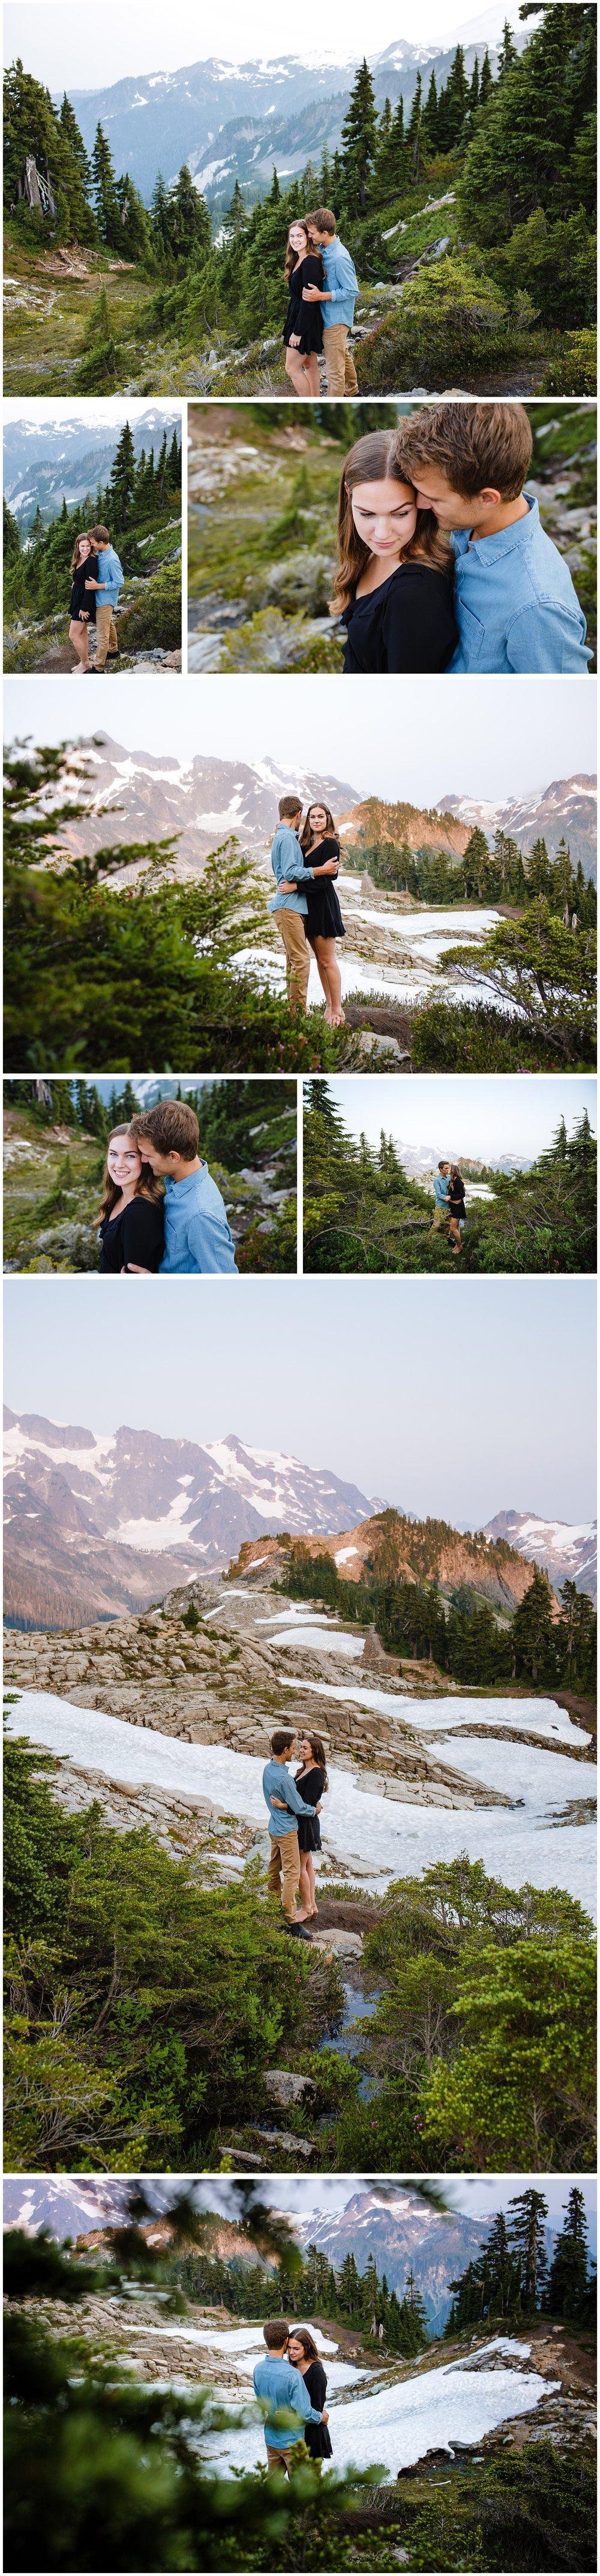 Mt Baker Artist Point Engagement Photography Mountain Inspo Couples Photographer Evening Romantic_0005.jpg